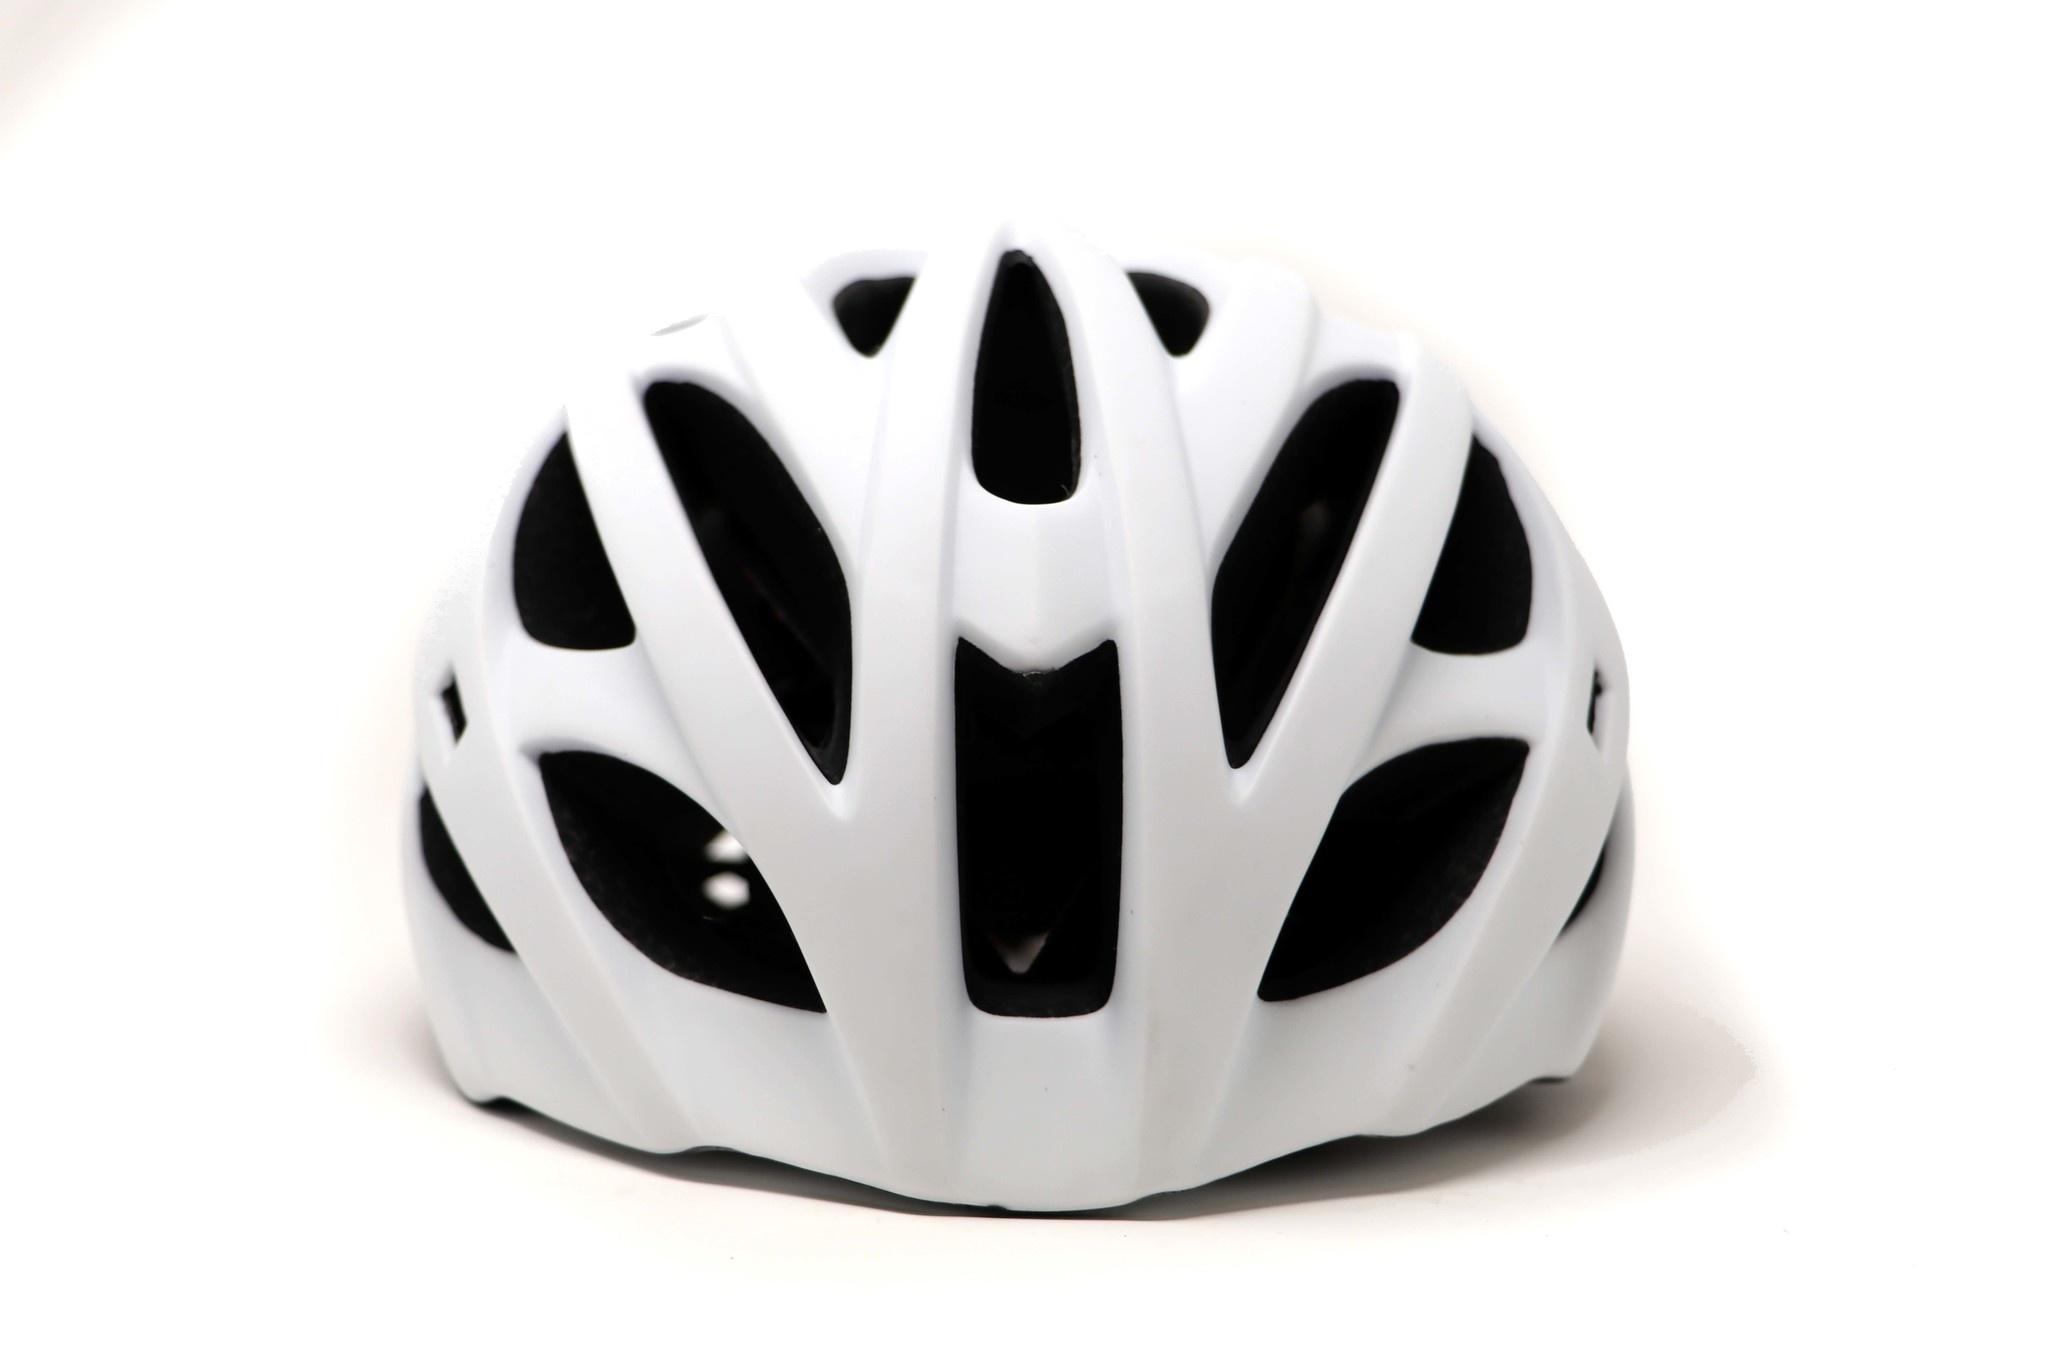 H93 Casco de Bicicleta y Roller Ski, BLANCO